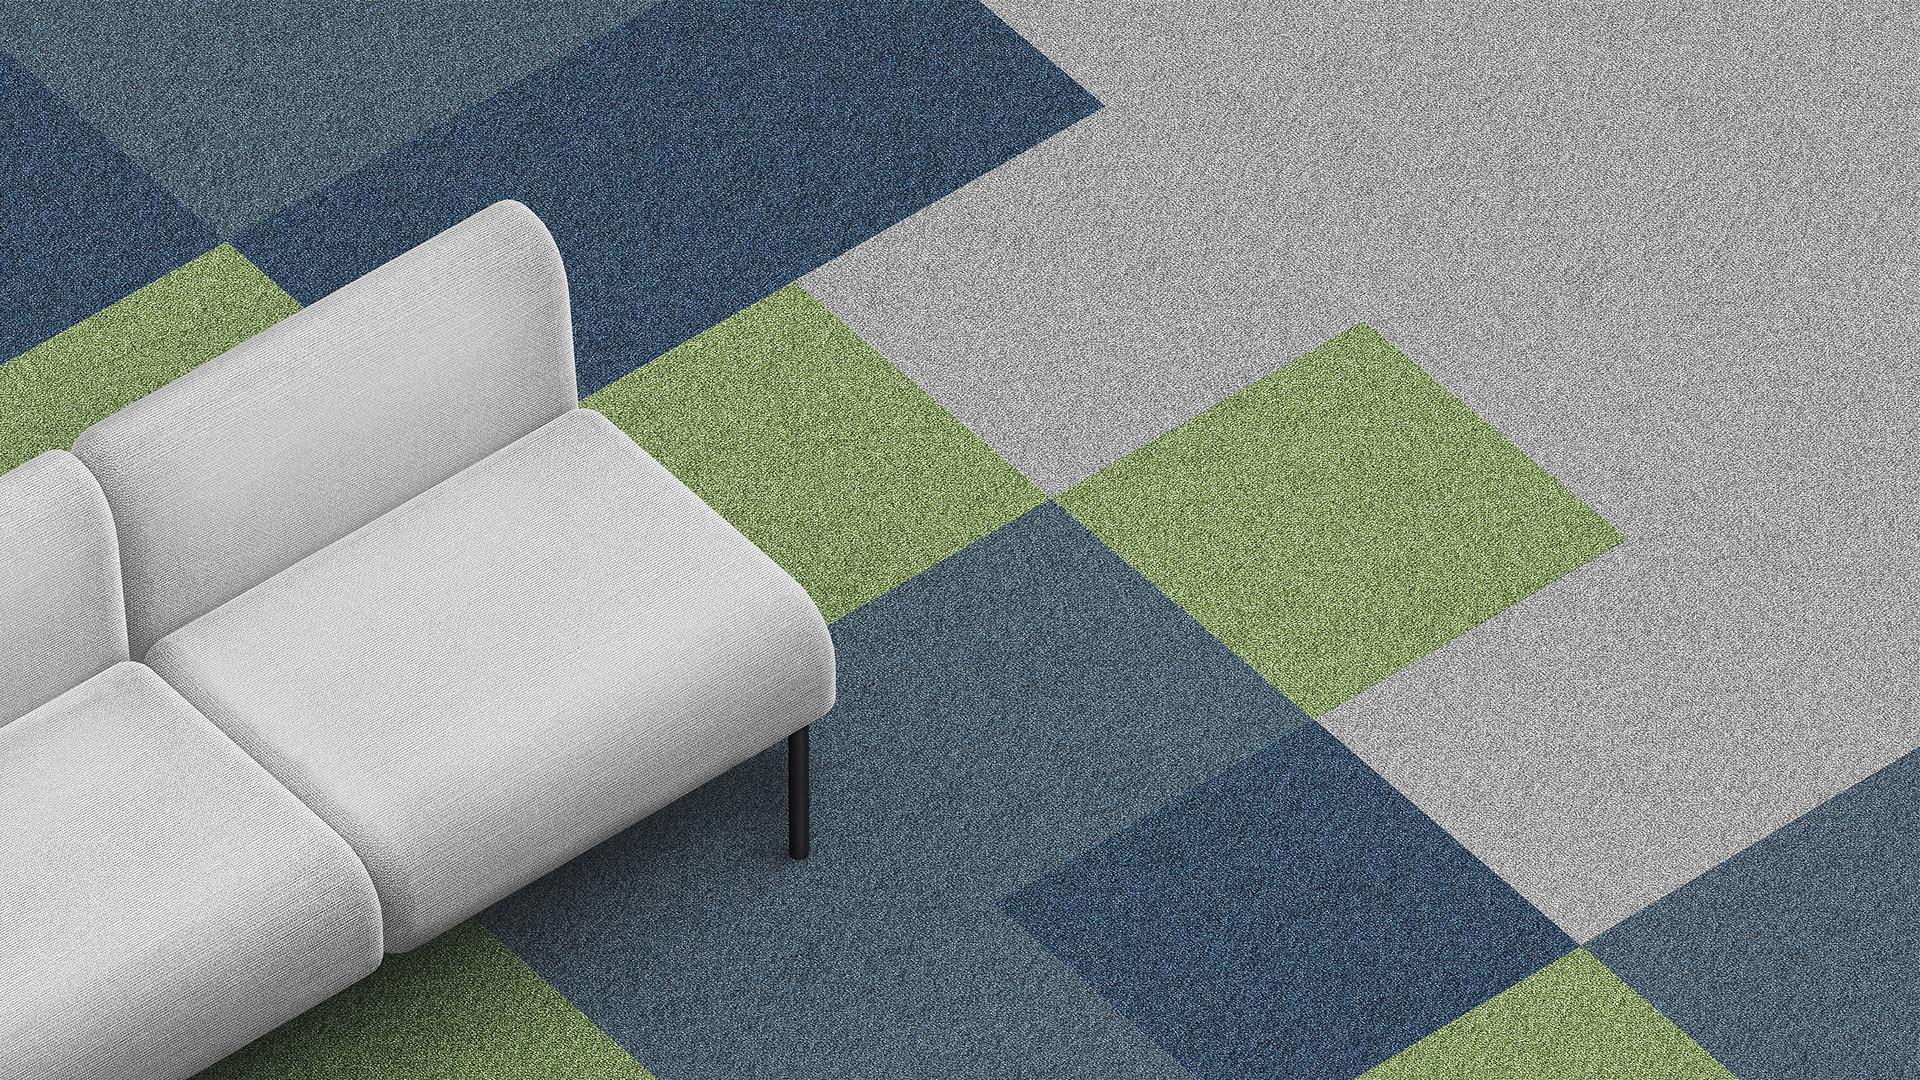 kavrolex_tile_carpet_00004_1.jpg